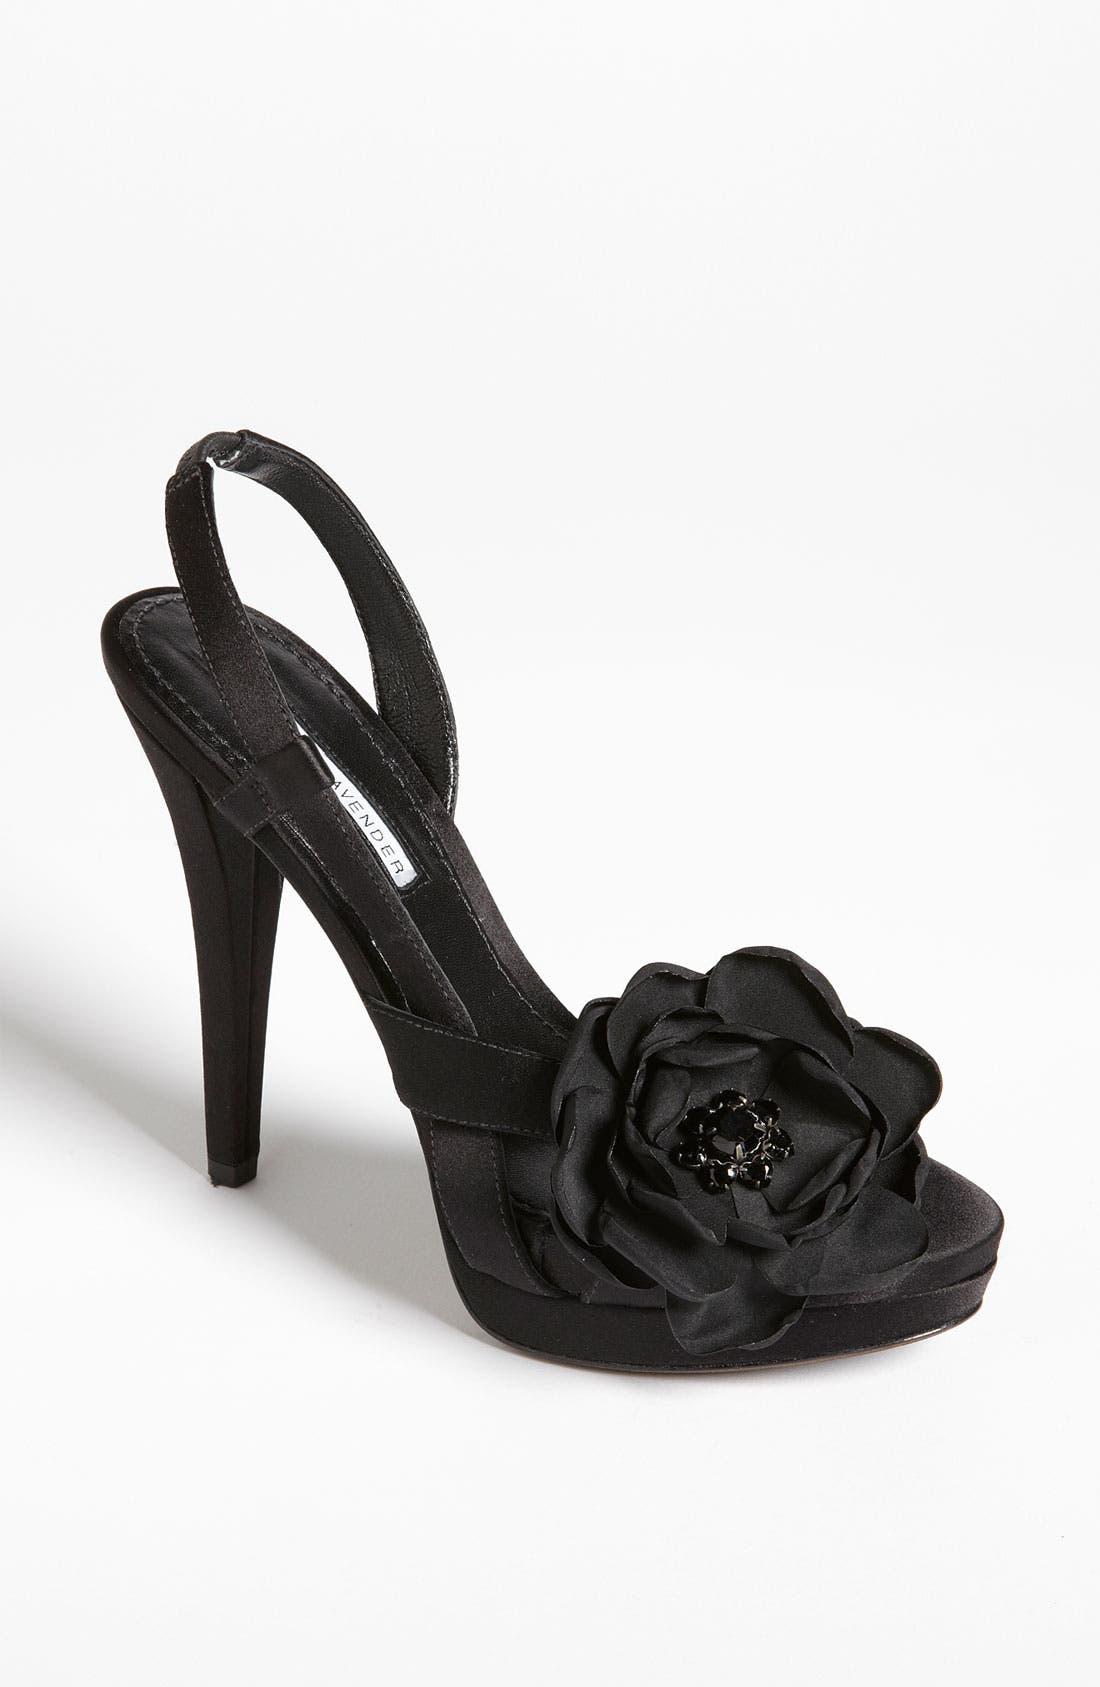 Alternate Image 1 Selected - Vera Wang Footwear 'Savy' Sandal